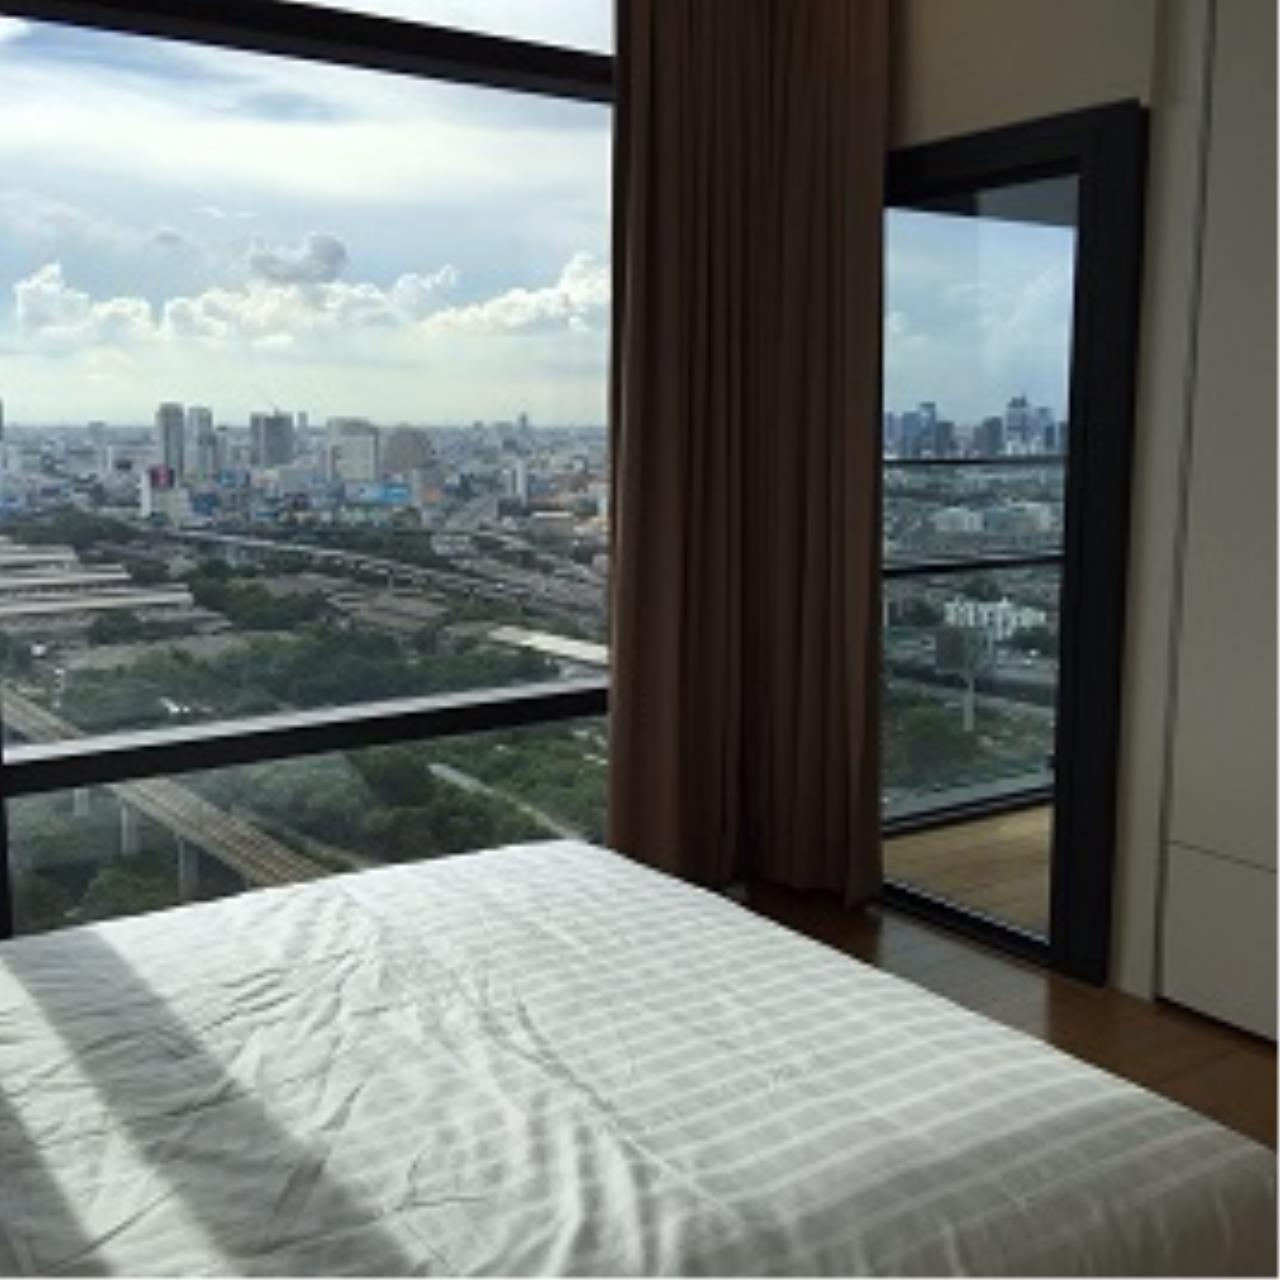 RE/MAX All Star Realty Agency's One Bedder (48sqm) Circle 2 Living Prototype Condo Rent cheap – walk to BTS Nana, ARL Makkasan, MRT Petchaburi 3